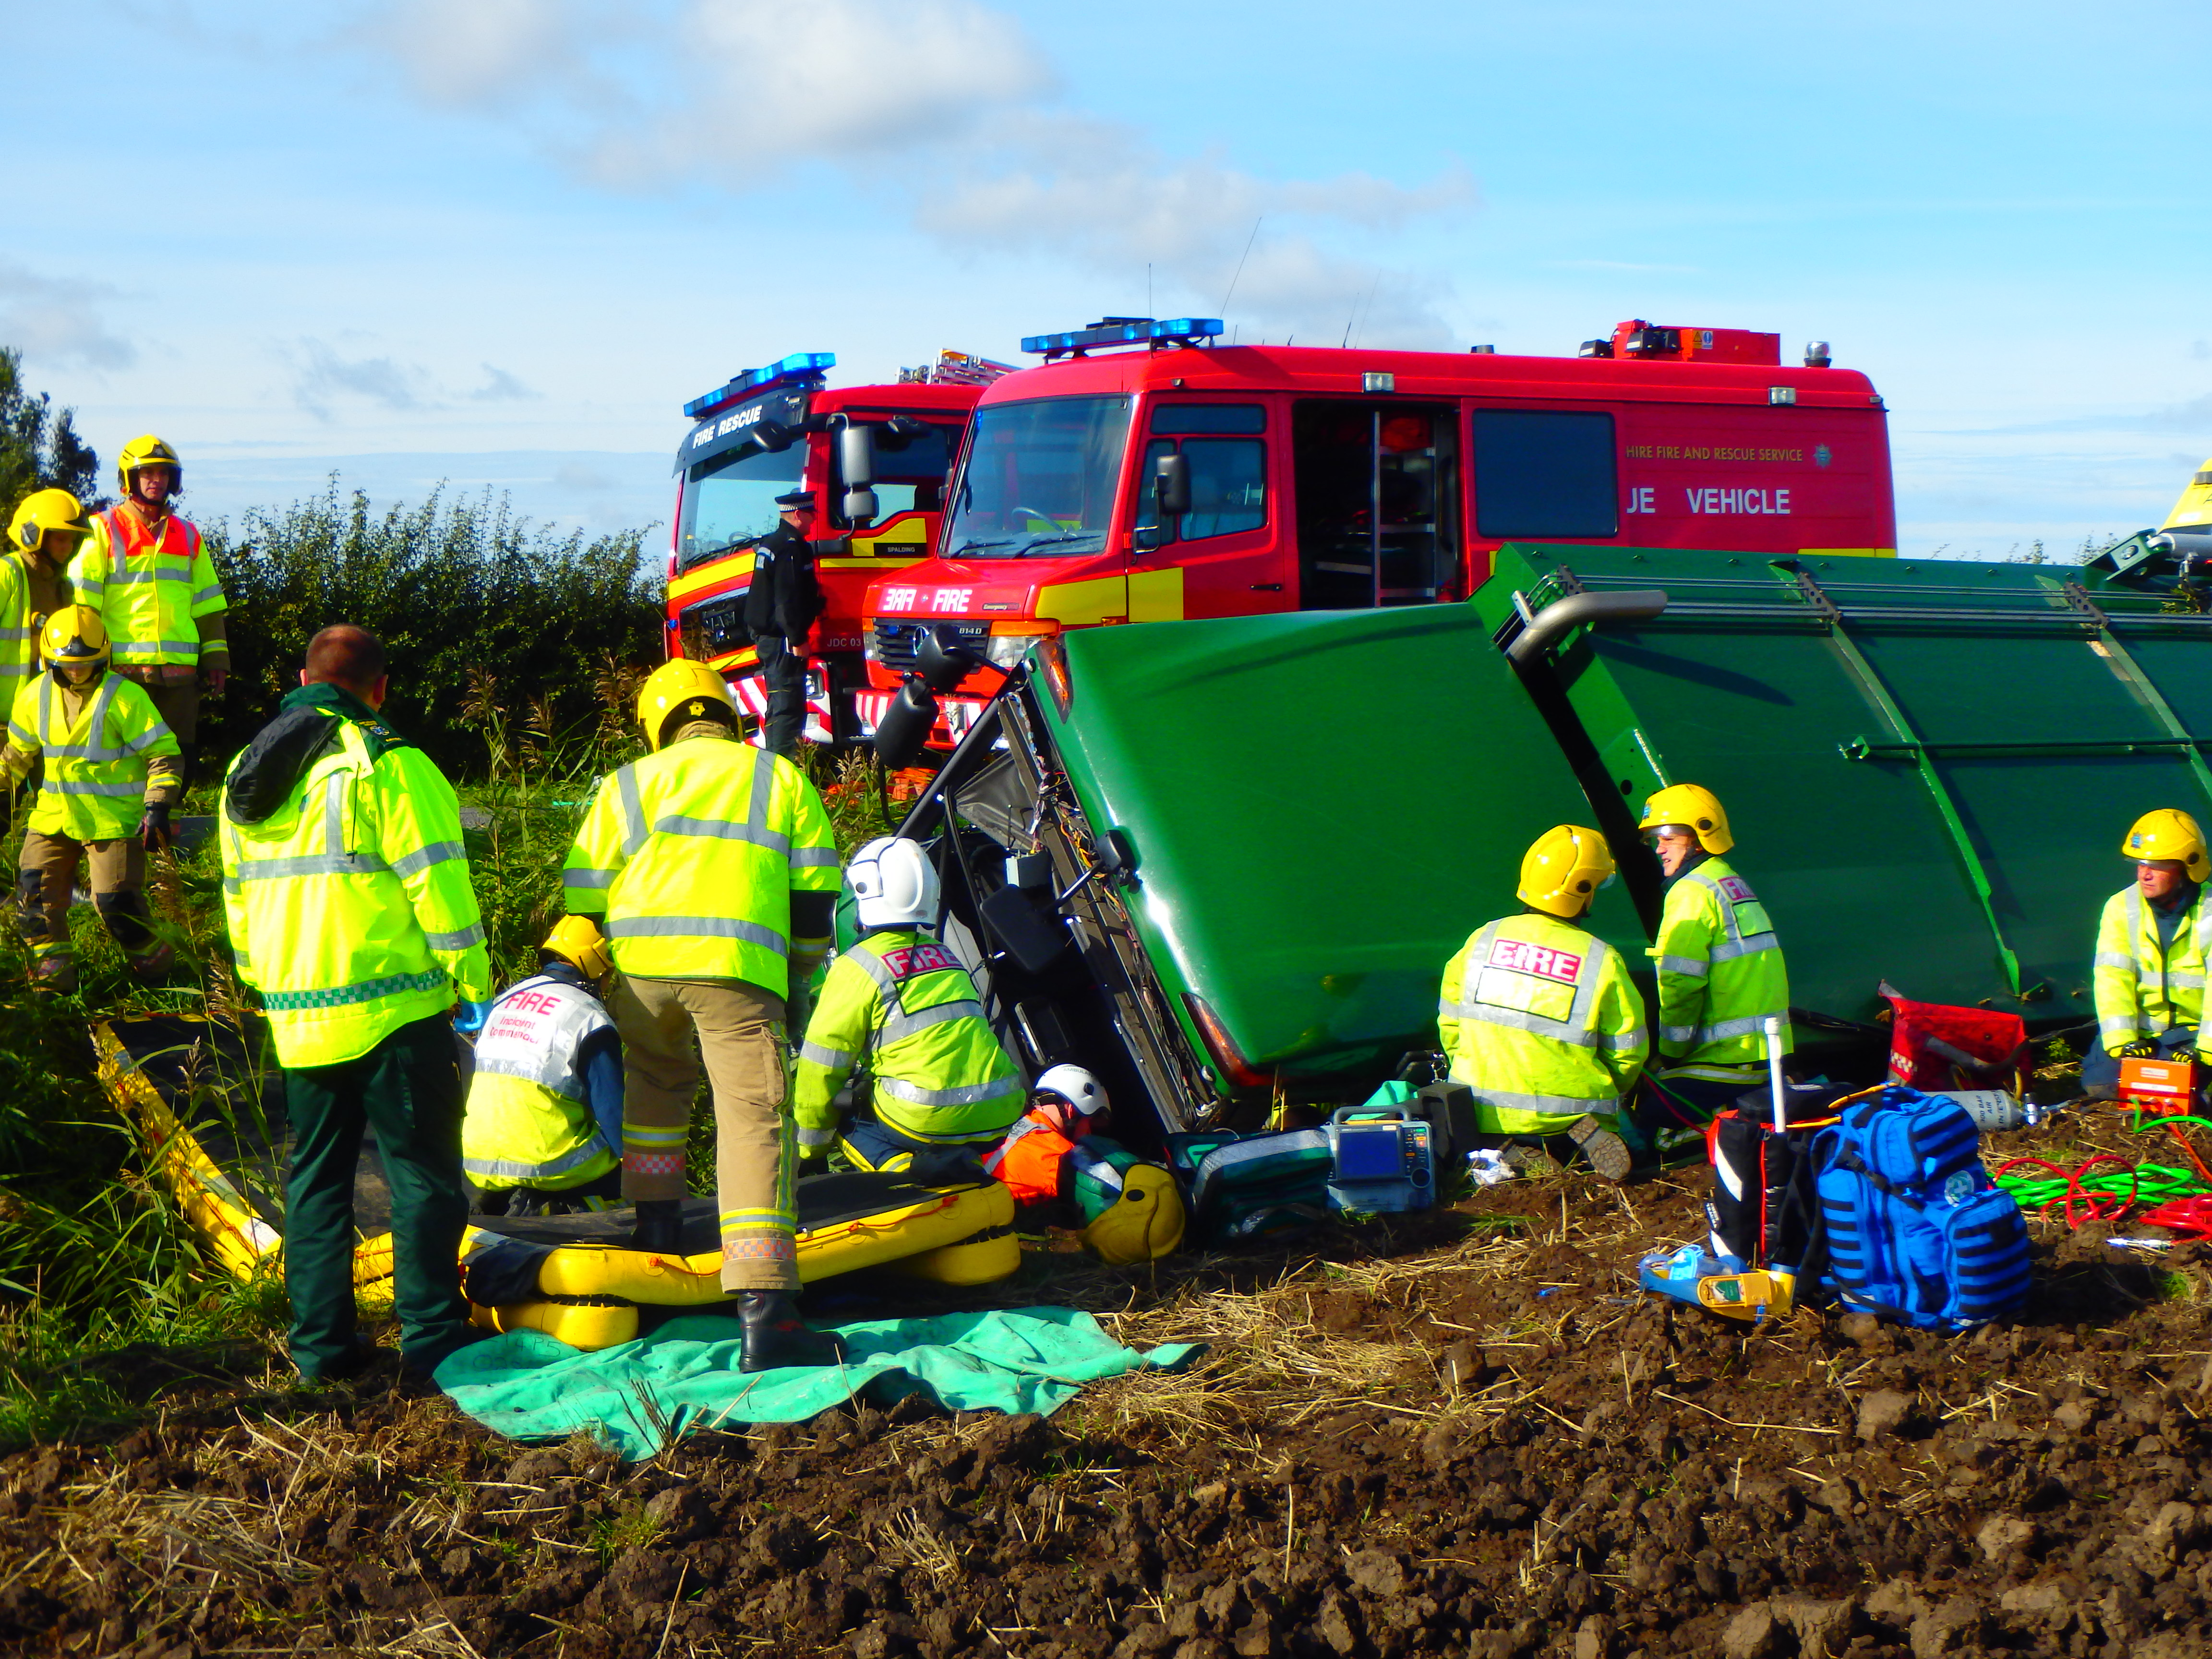 23rd-September---Crowland-bin-lorry-collision.JPG